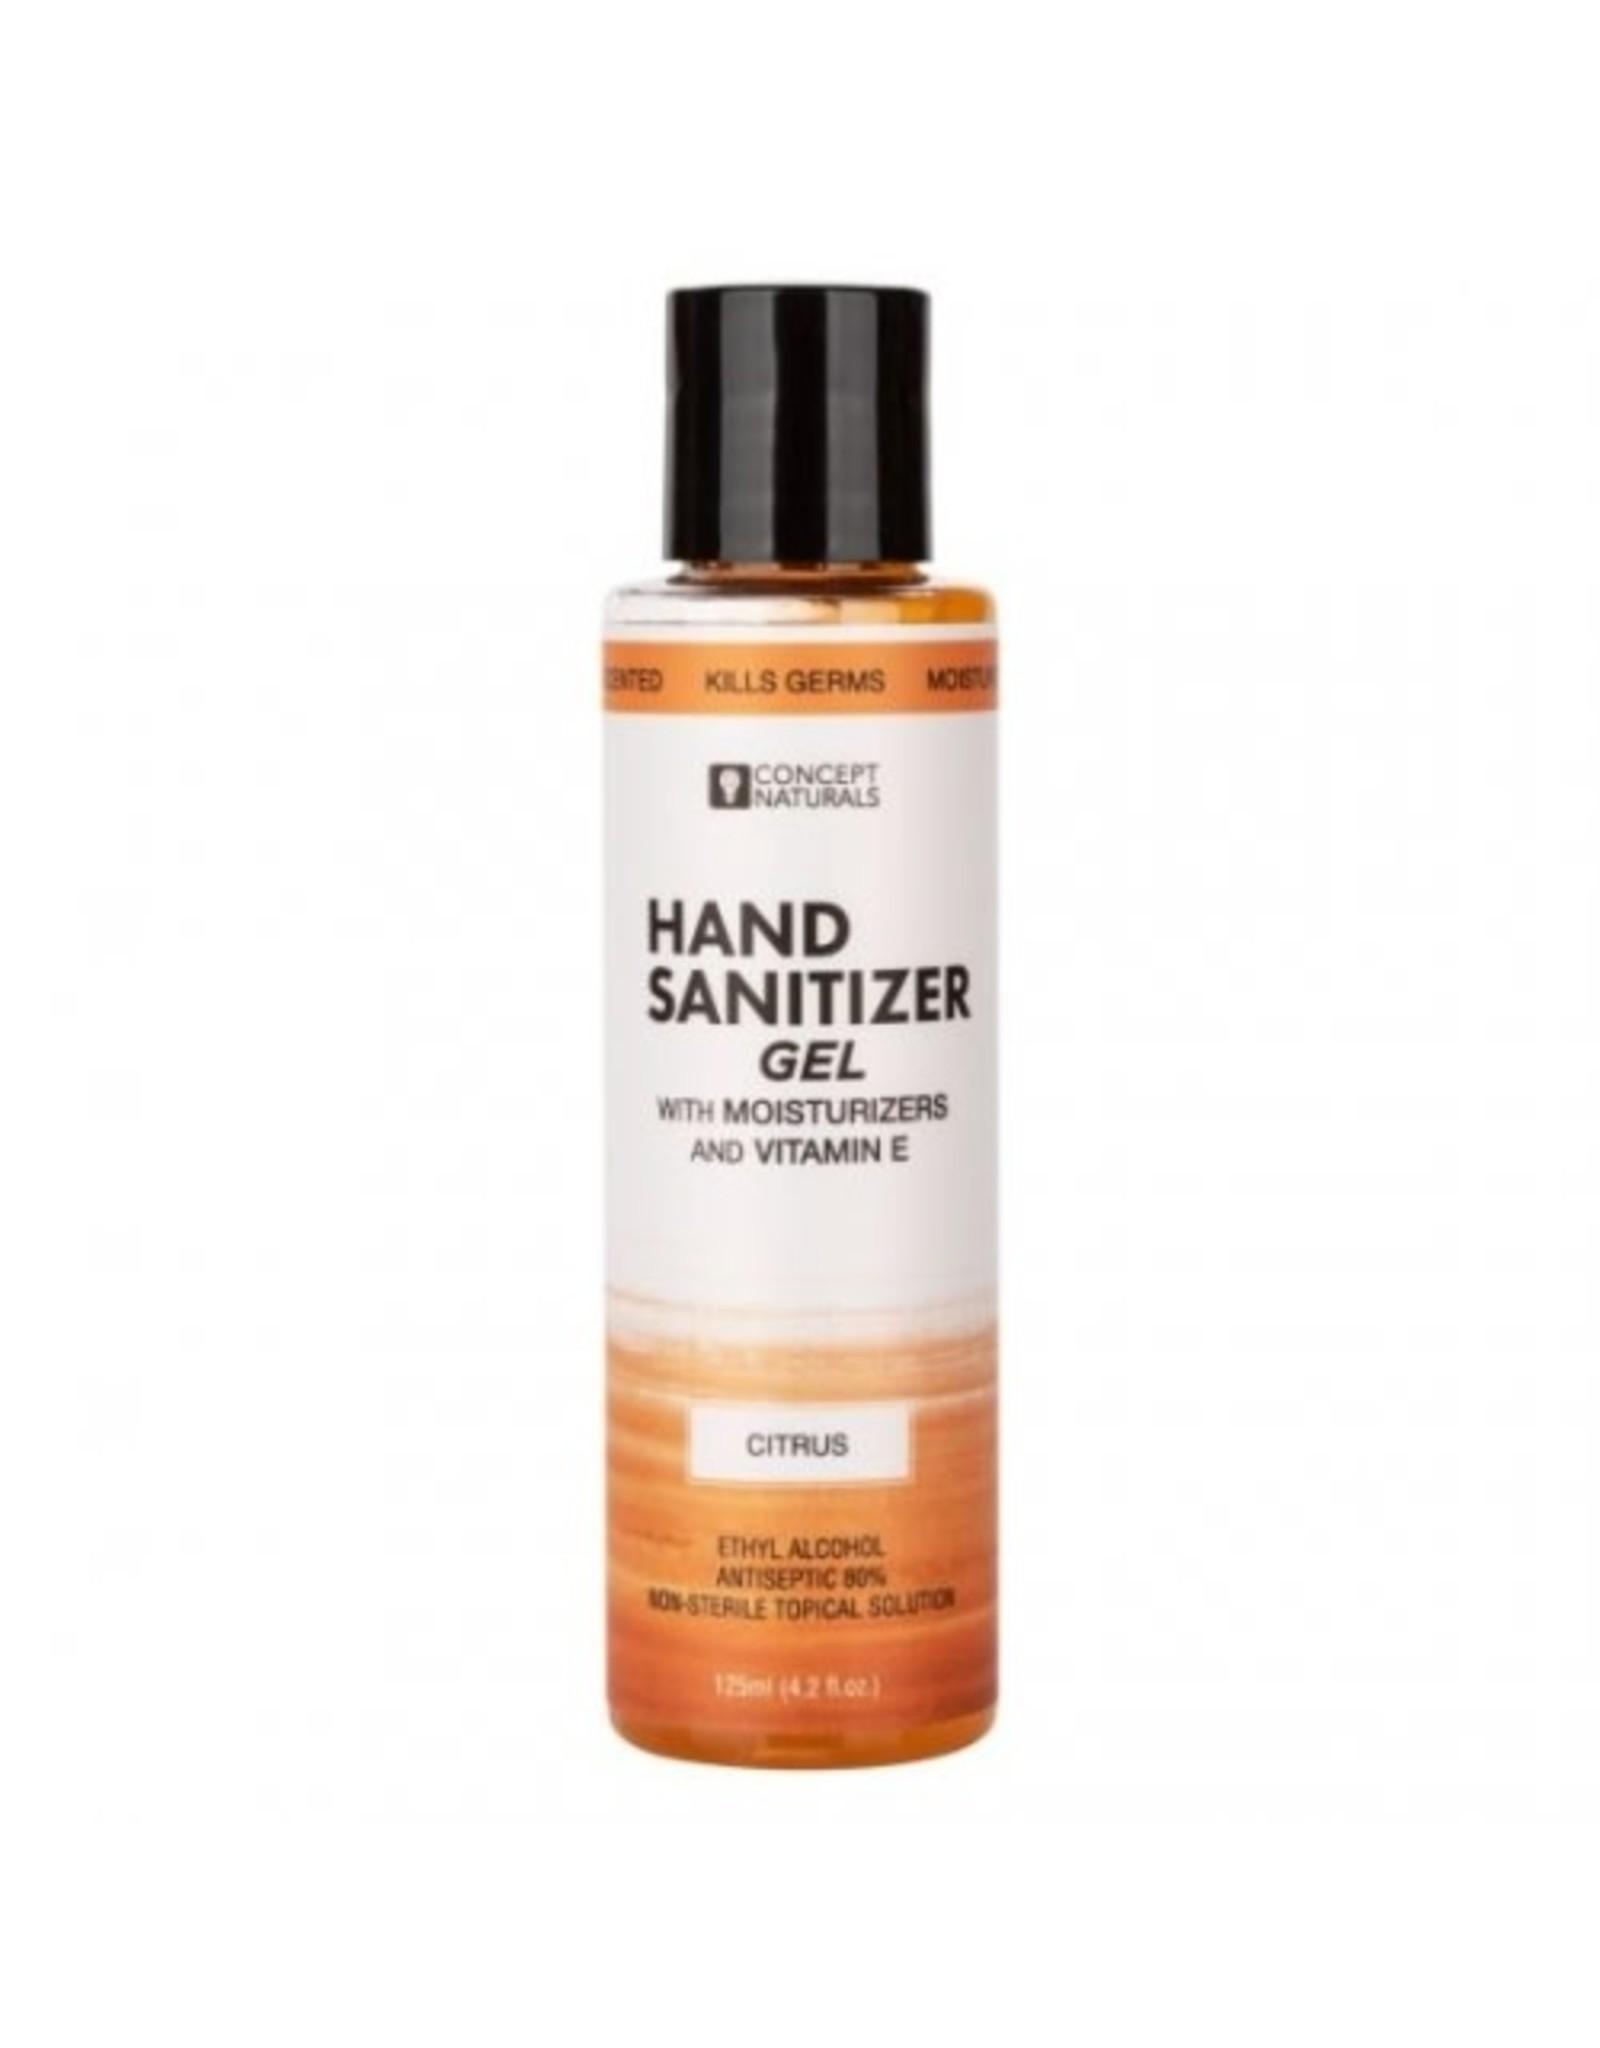 CALEXOTIC - HAND SANITIZER GEL - CITRUS 4.2 OZ.